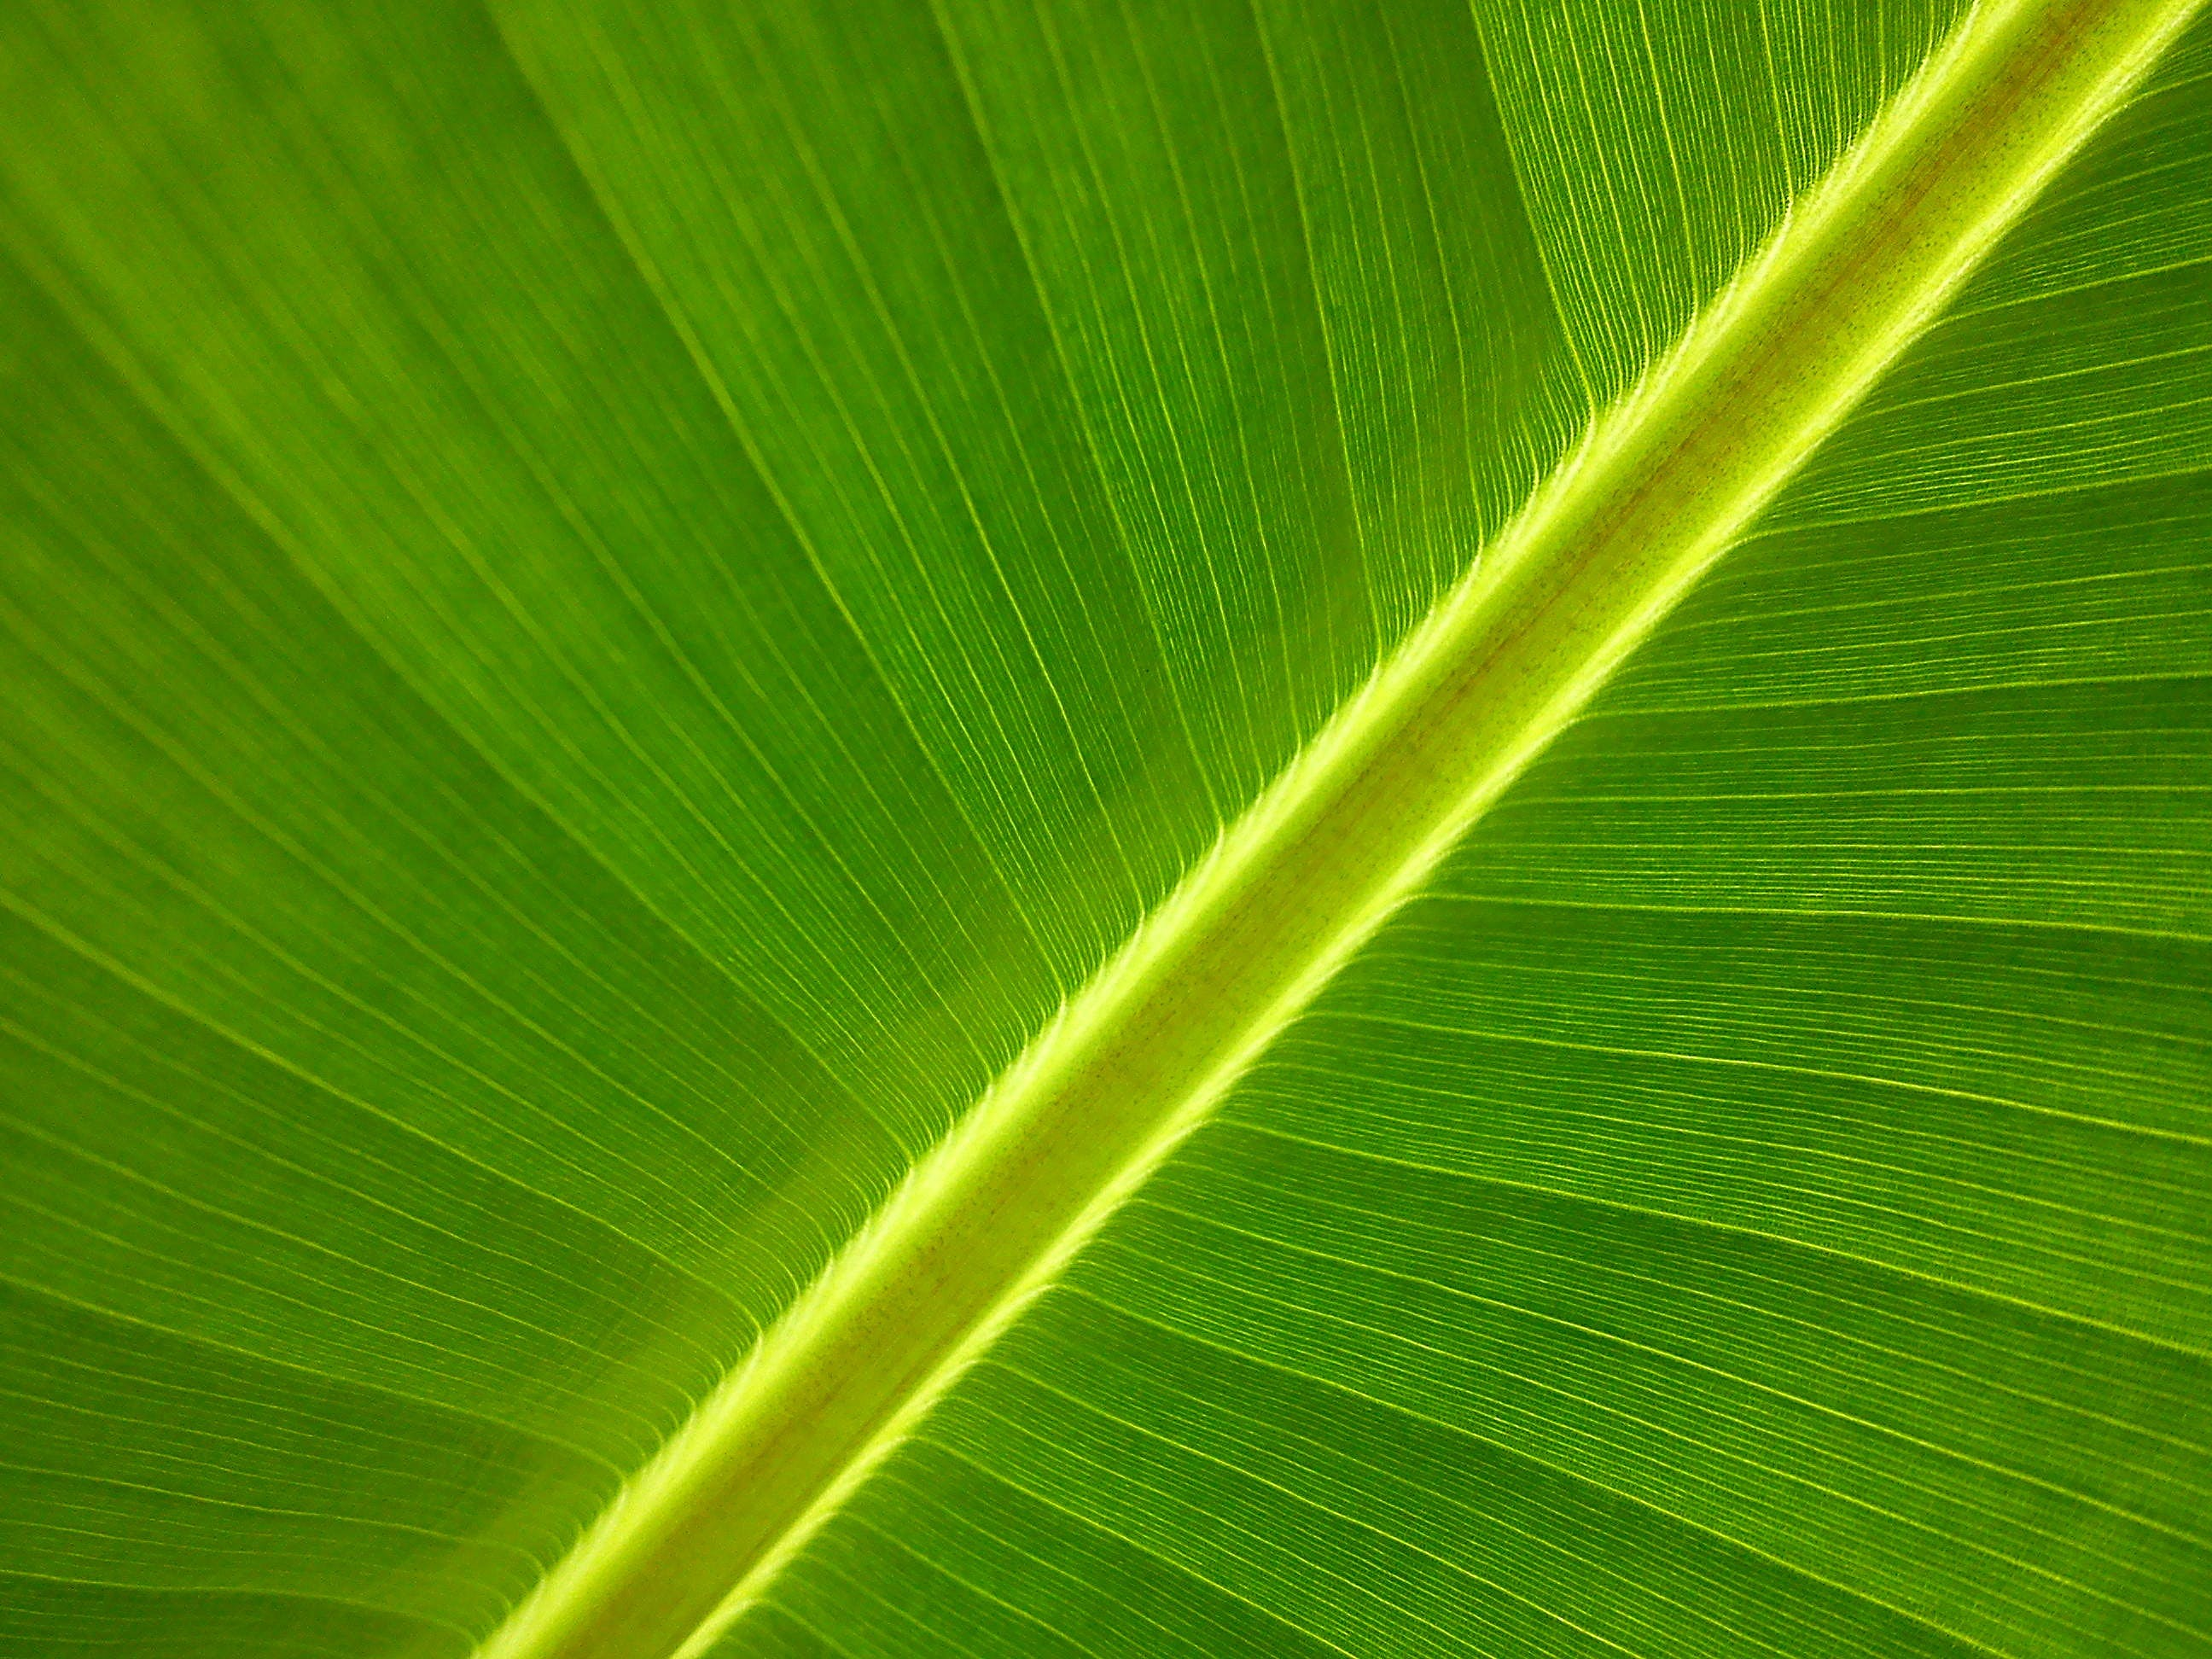 Free stock photo of garden, leaf, royalty free, banana tree